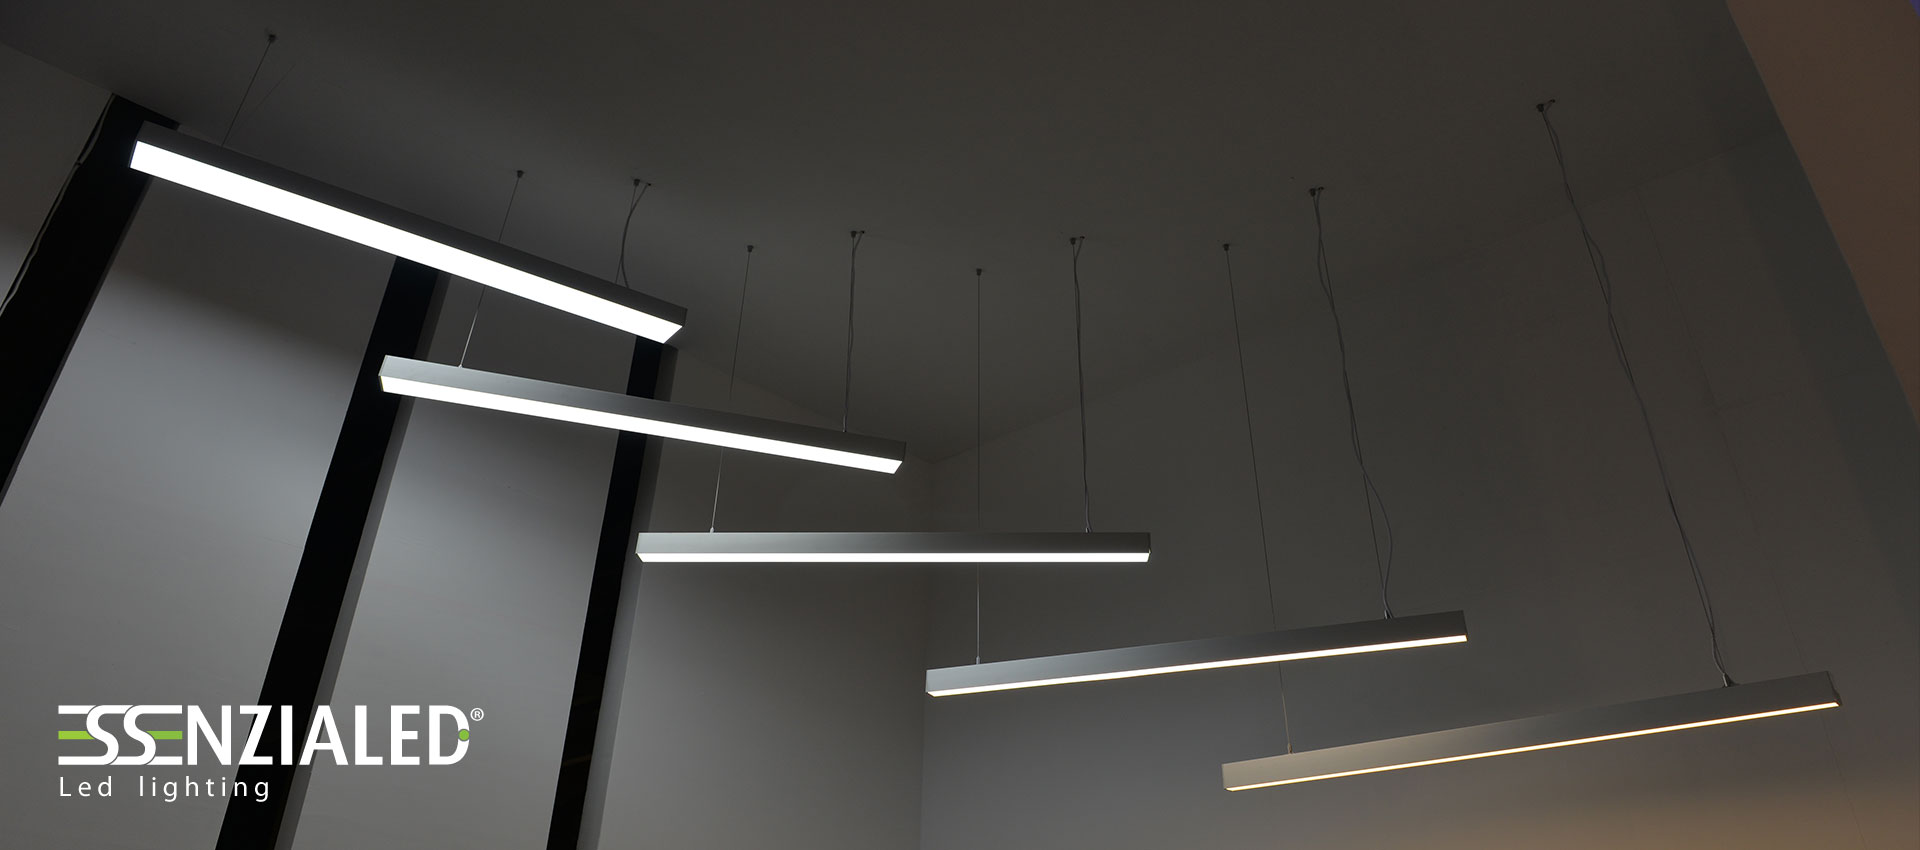 Illuminazione Led per ristoranti e bar - EssenzialedEssenzialed – Illuminazio...